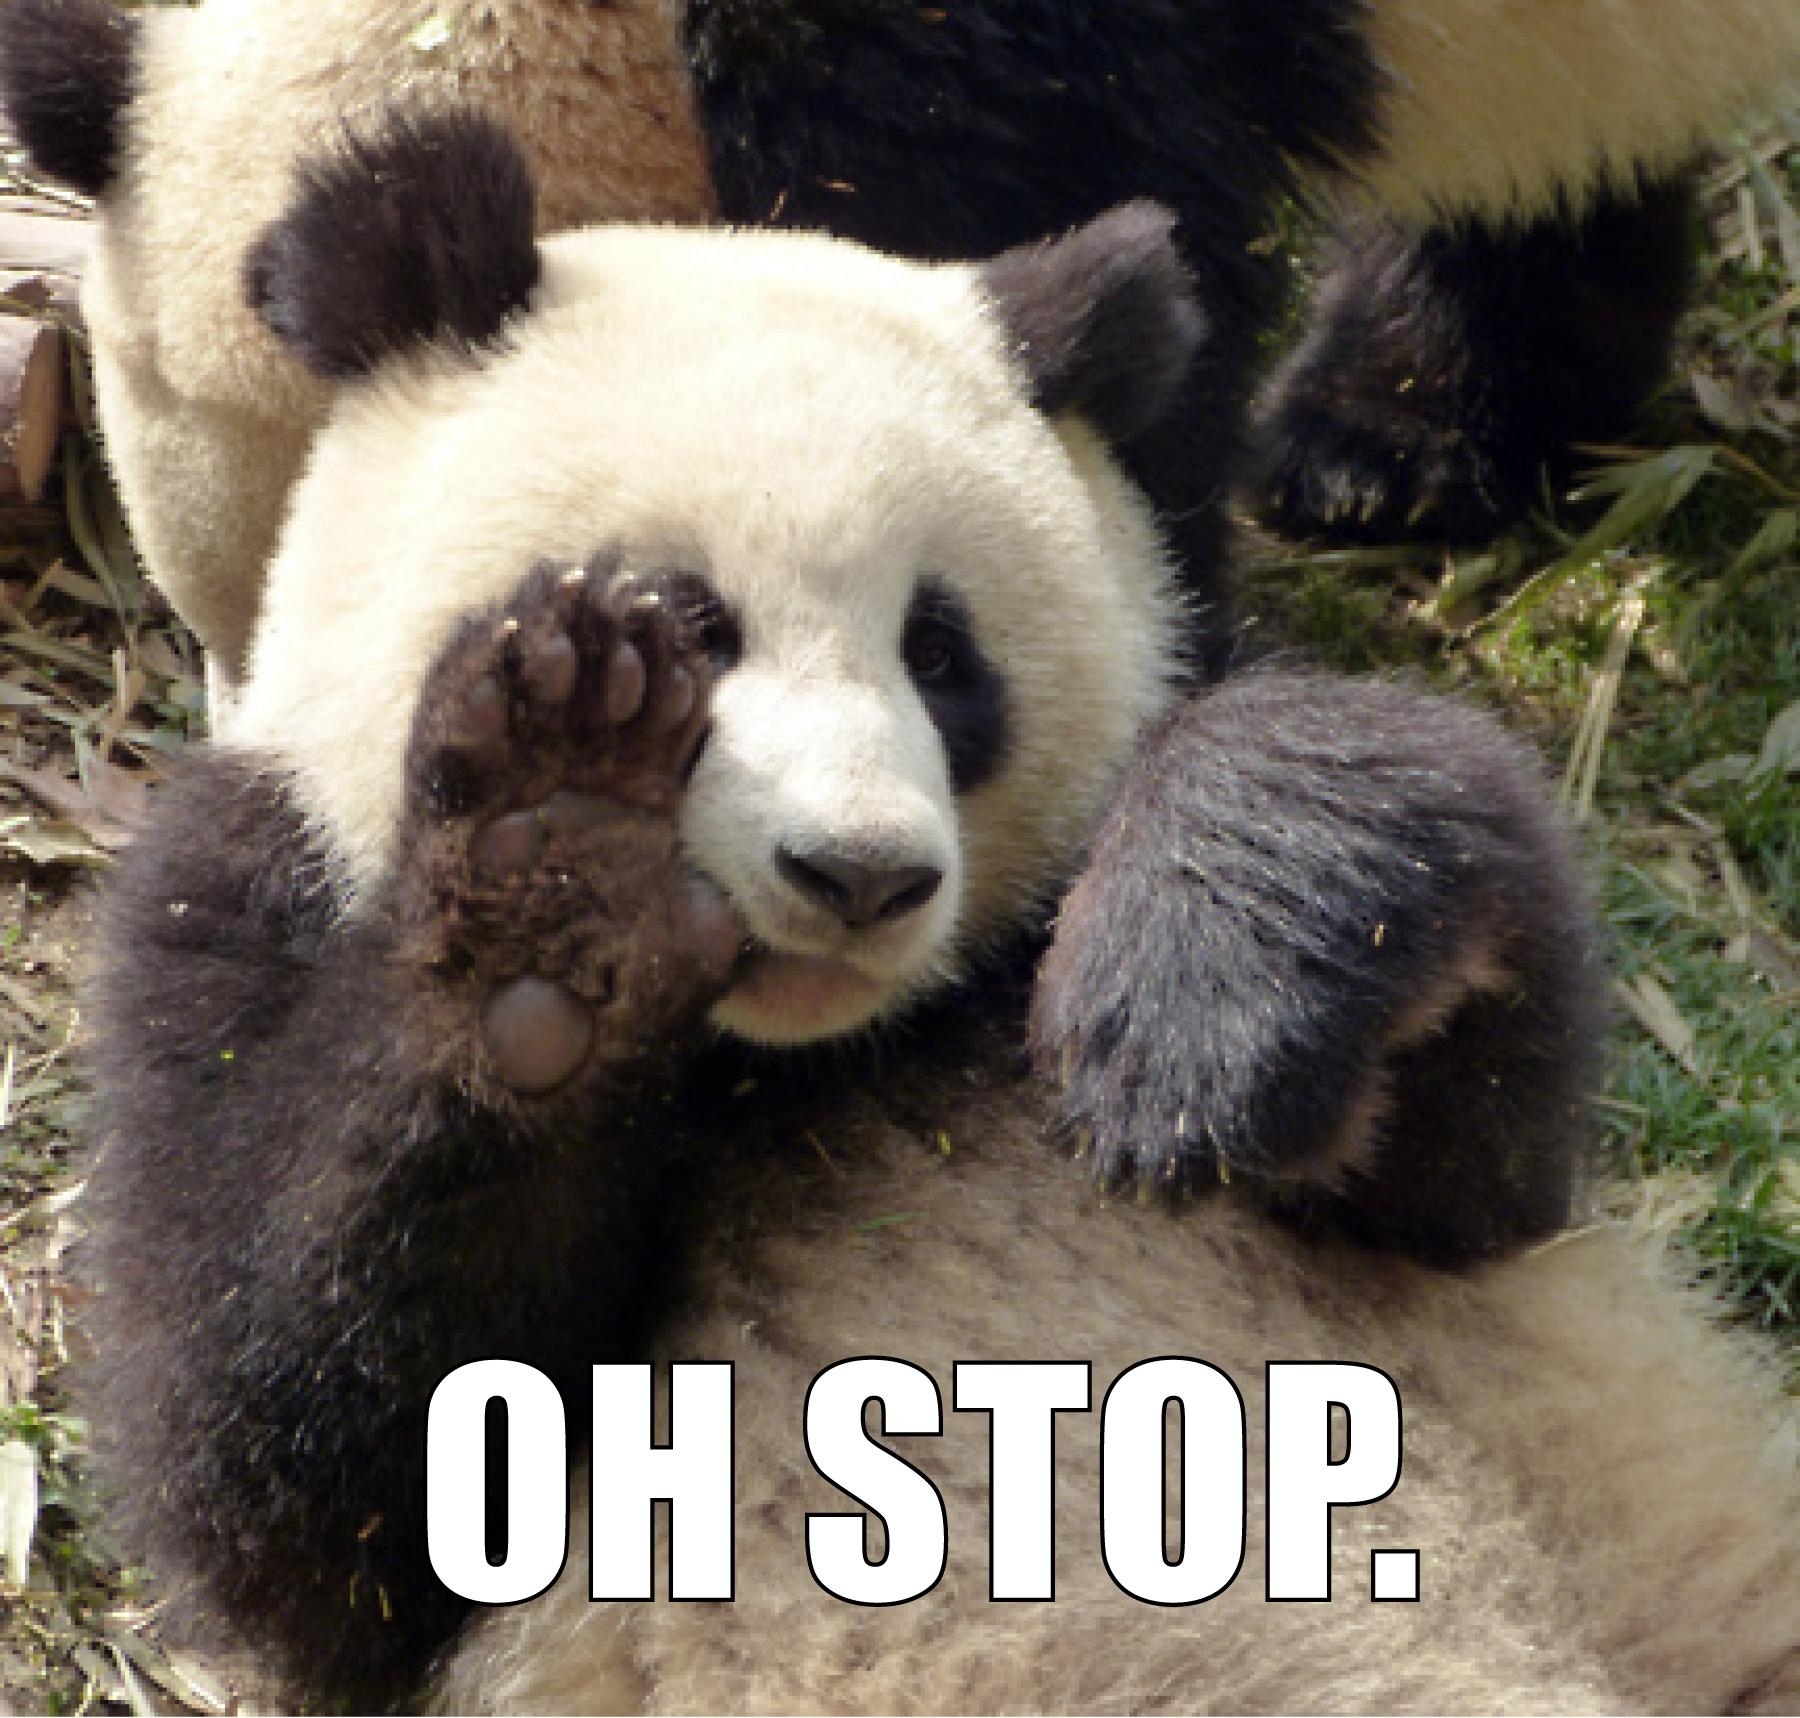 Funny panda memes - photo#17